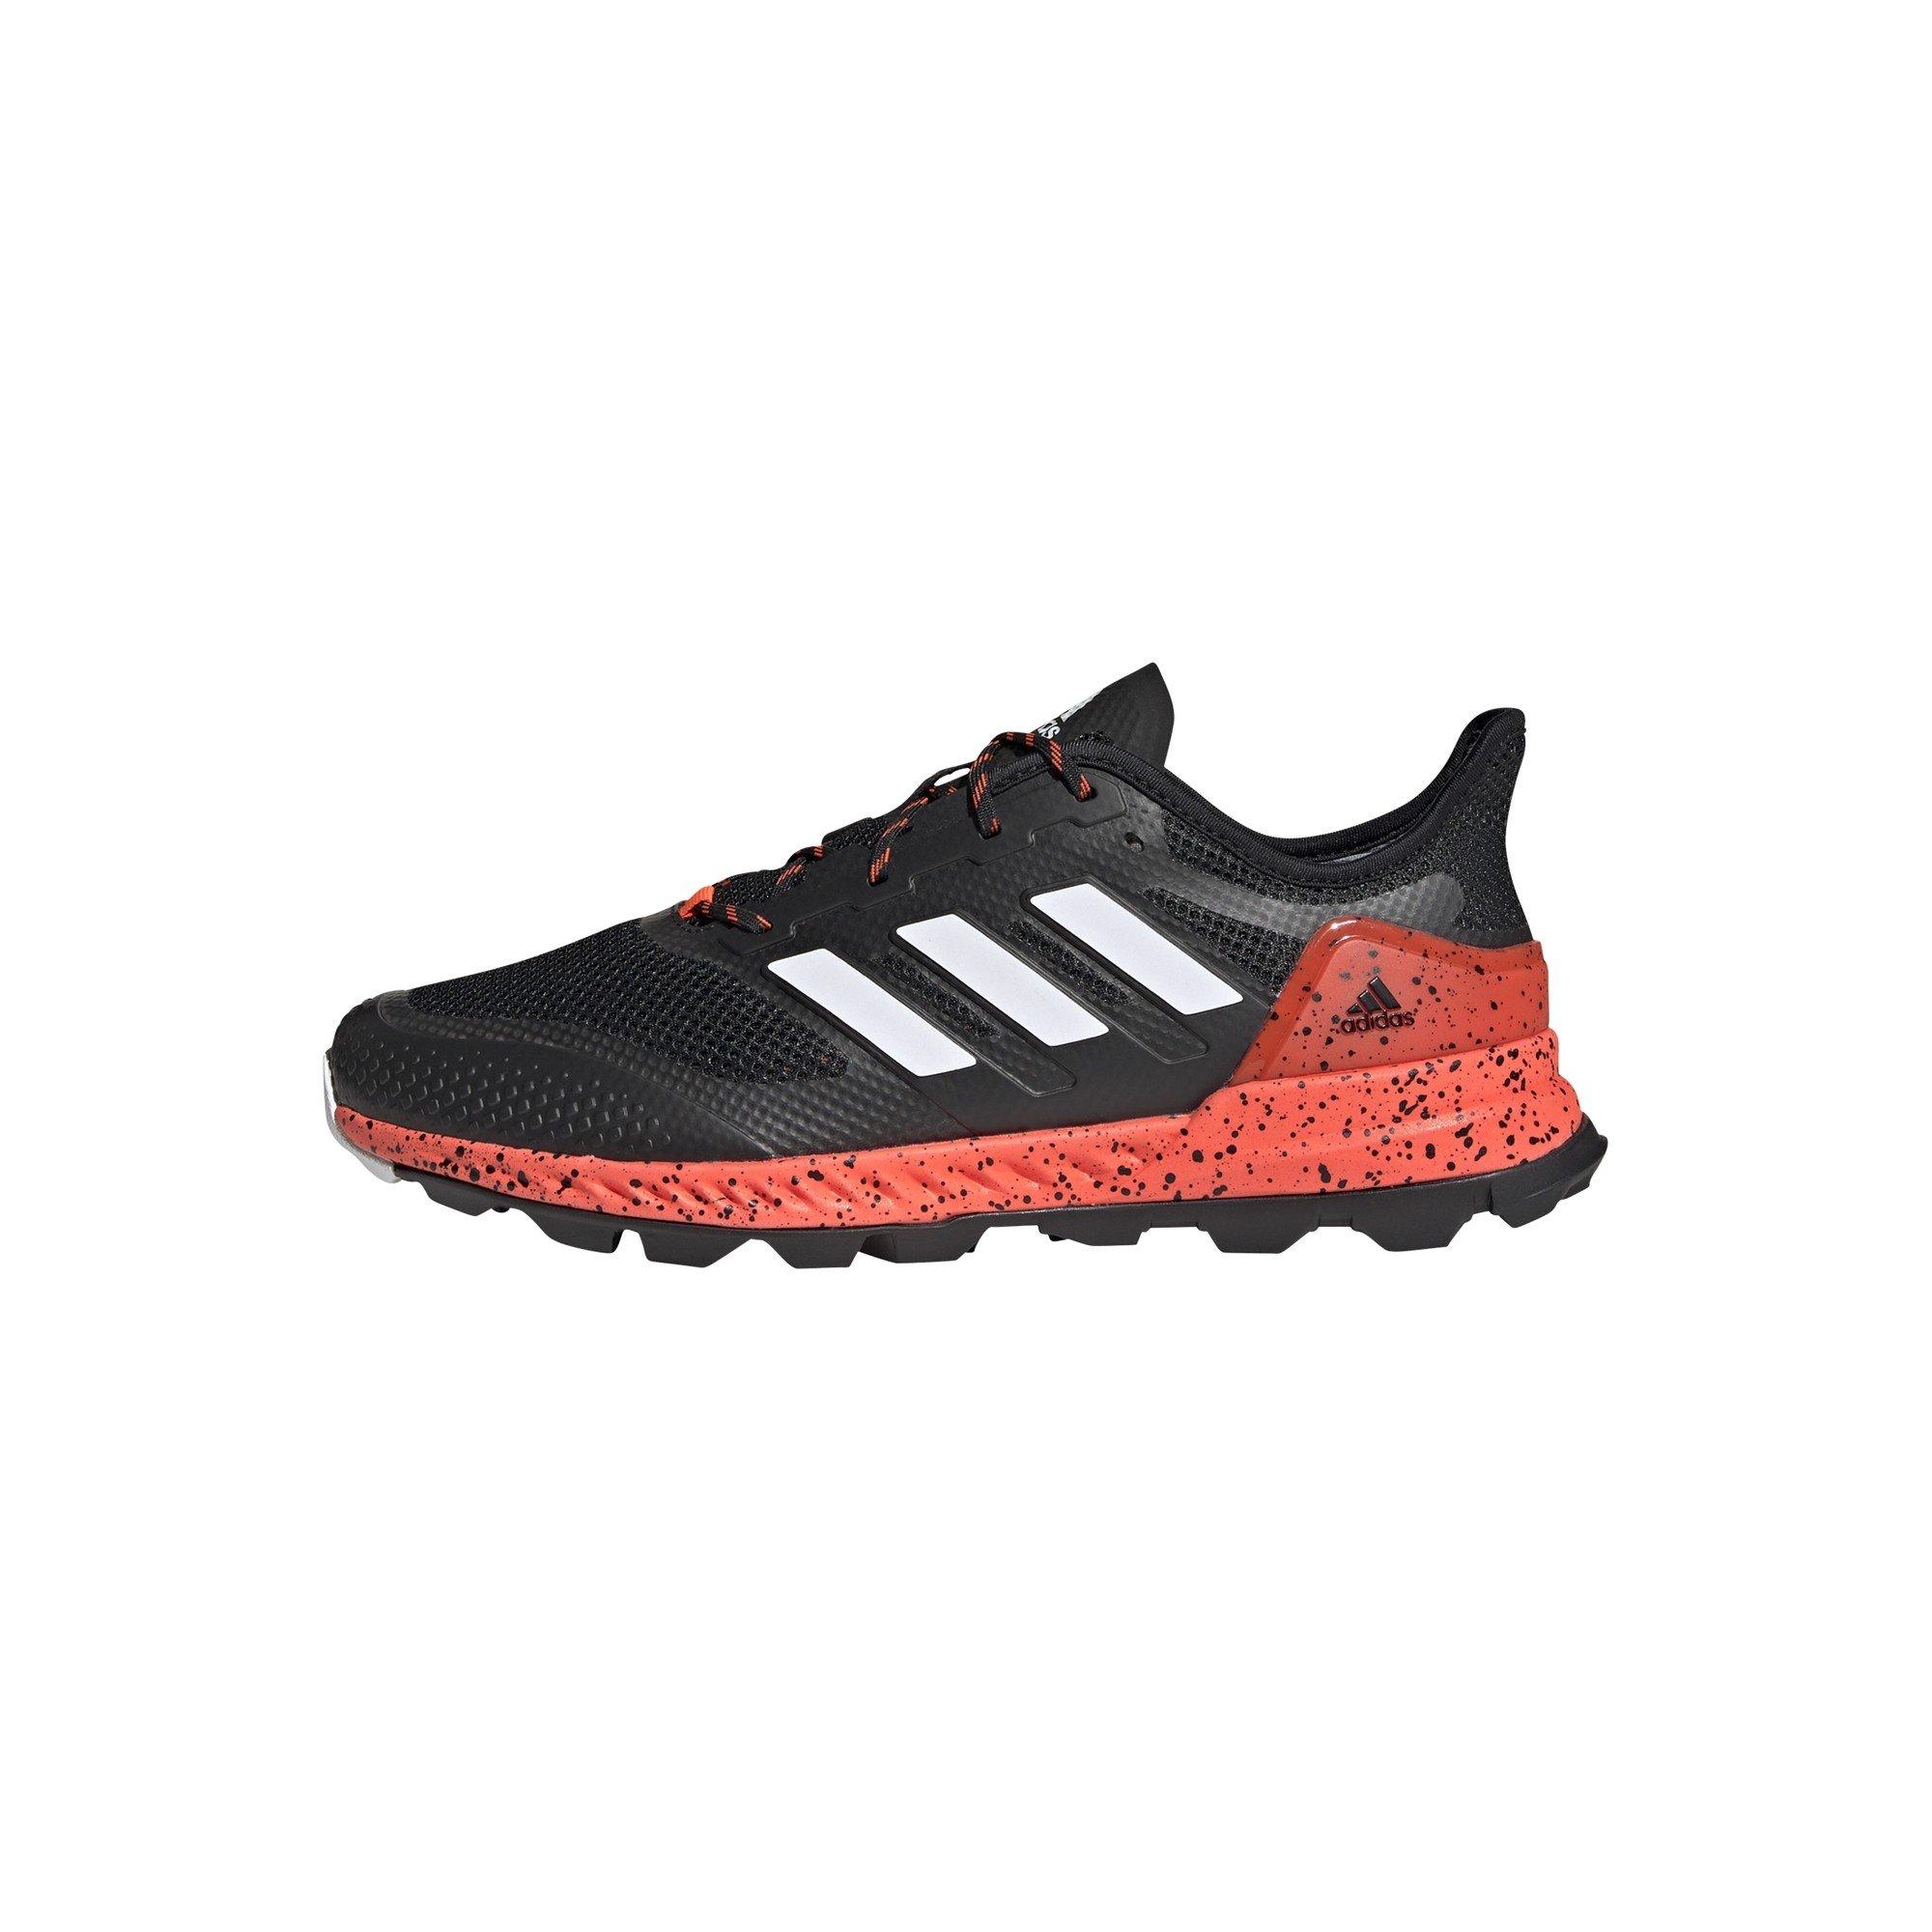 2021/22 Adidas Adipower 2.1 Hockey Shoes - Black/White